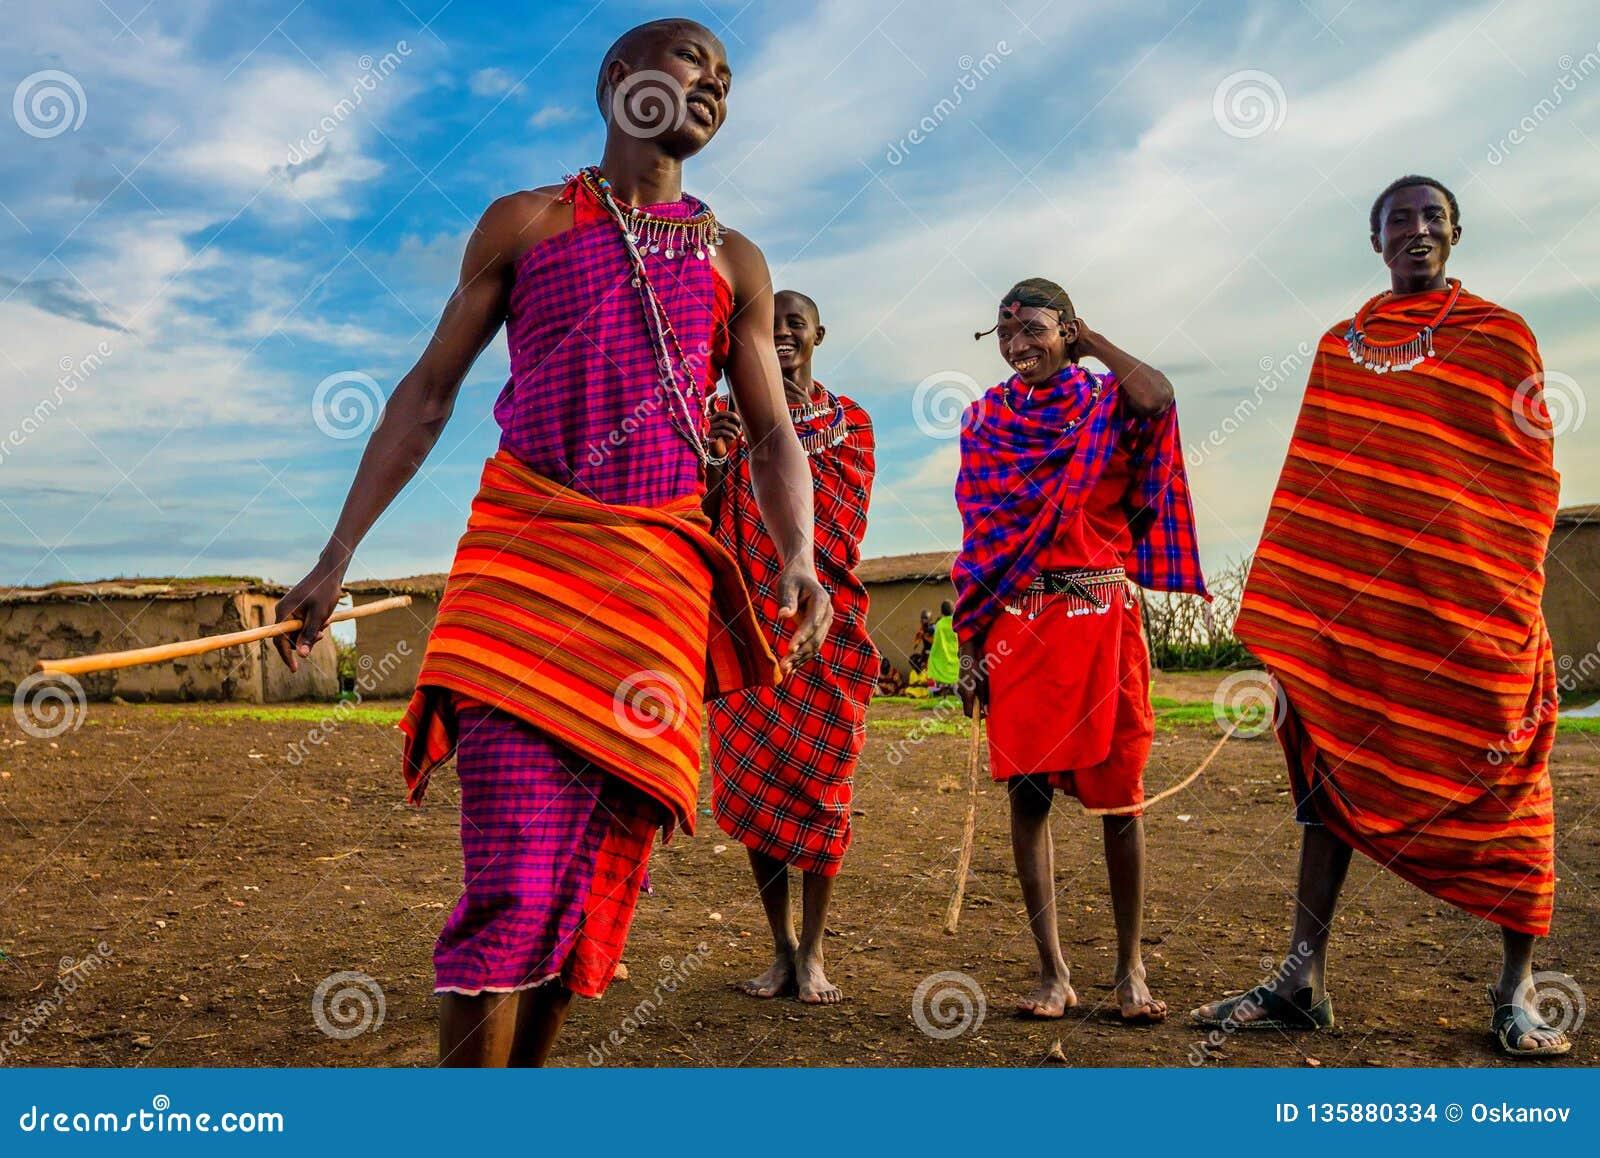 VILLAGE DE MAASAI, KENYA - 2 JANVIER 2015 : Personnes non identifiées de Maasai au Kenya